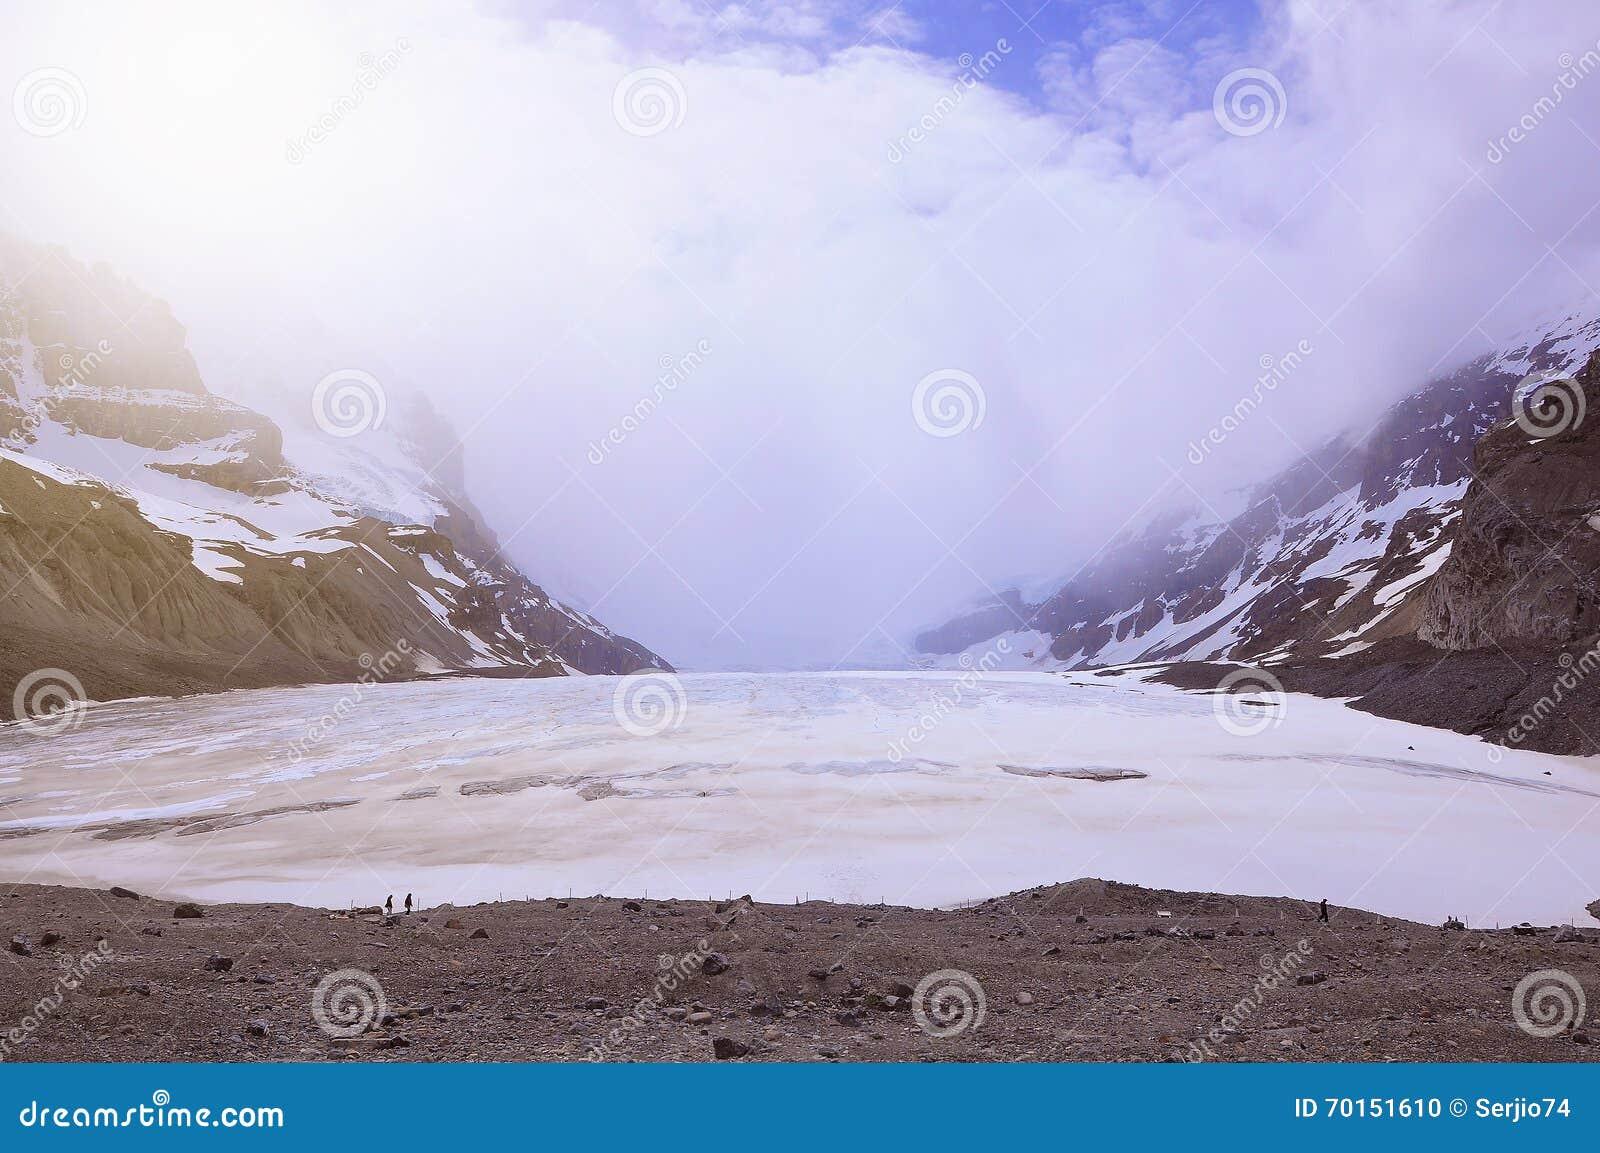 Athabascagletsjer - een deel van Colimbia Icefield